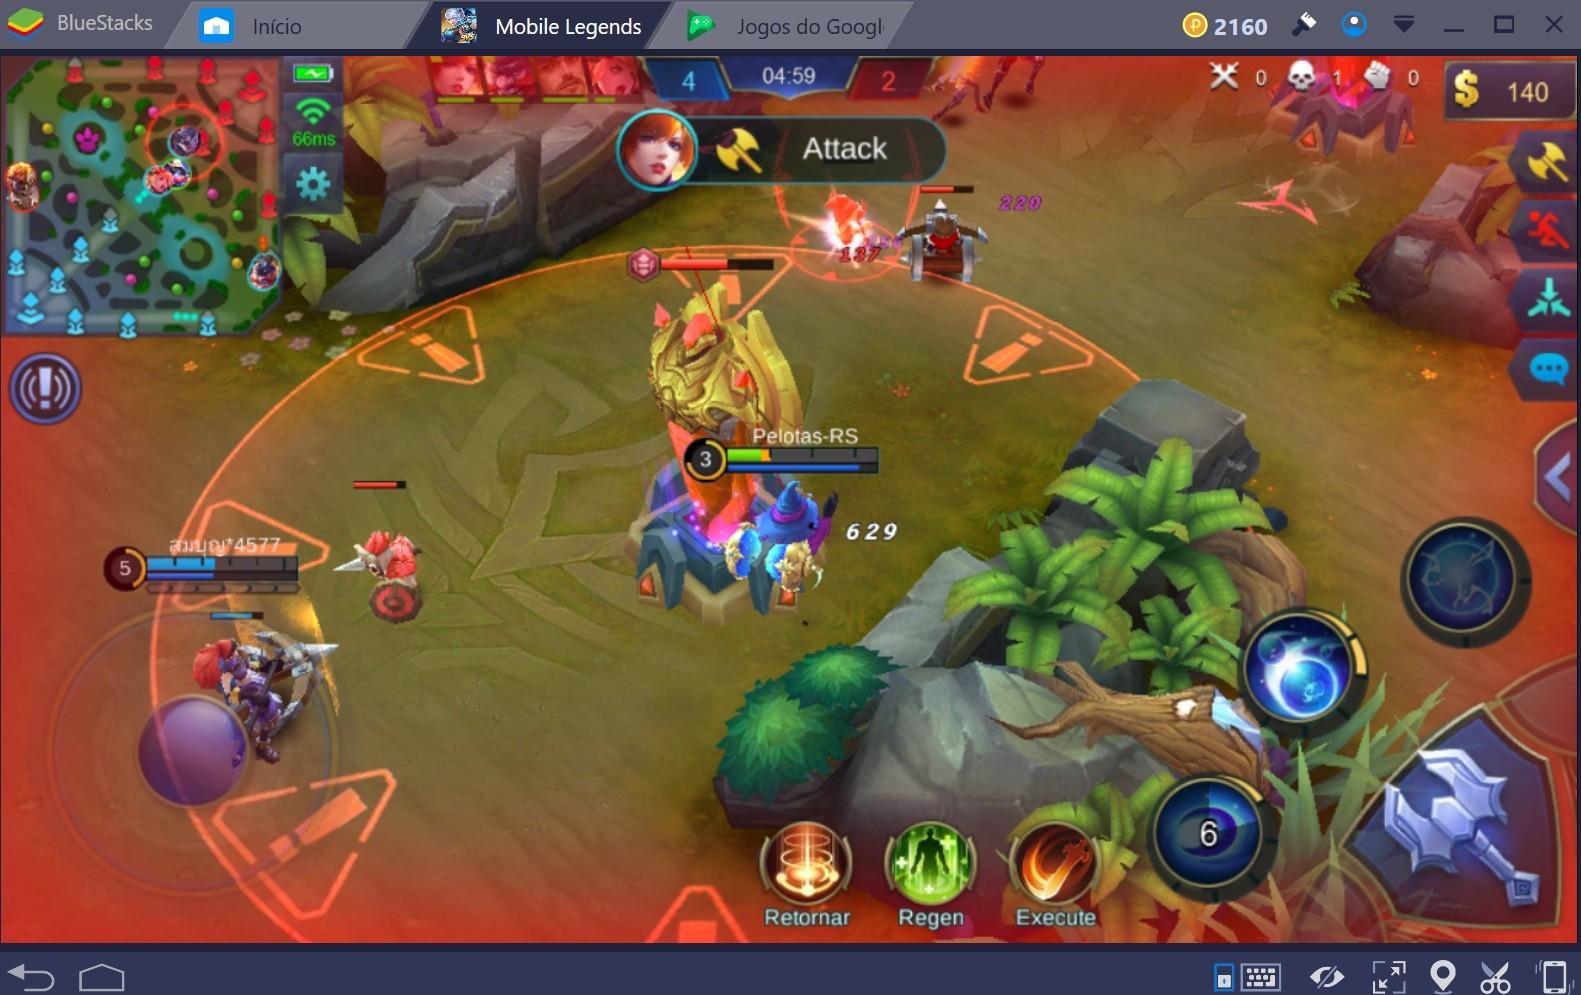 BlueStacks 4: a melhor jogar de jogar MOBA